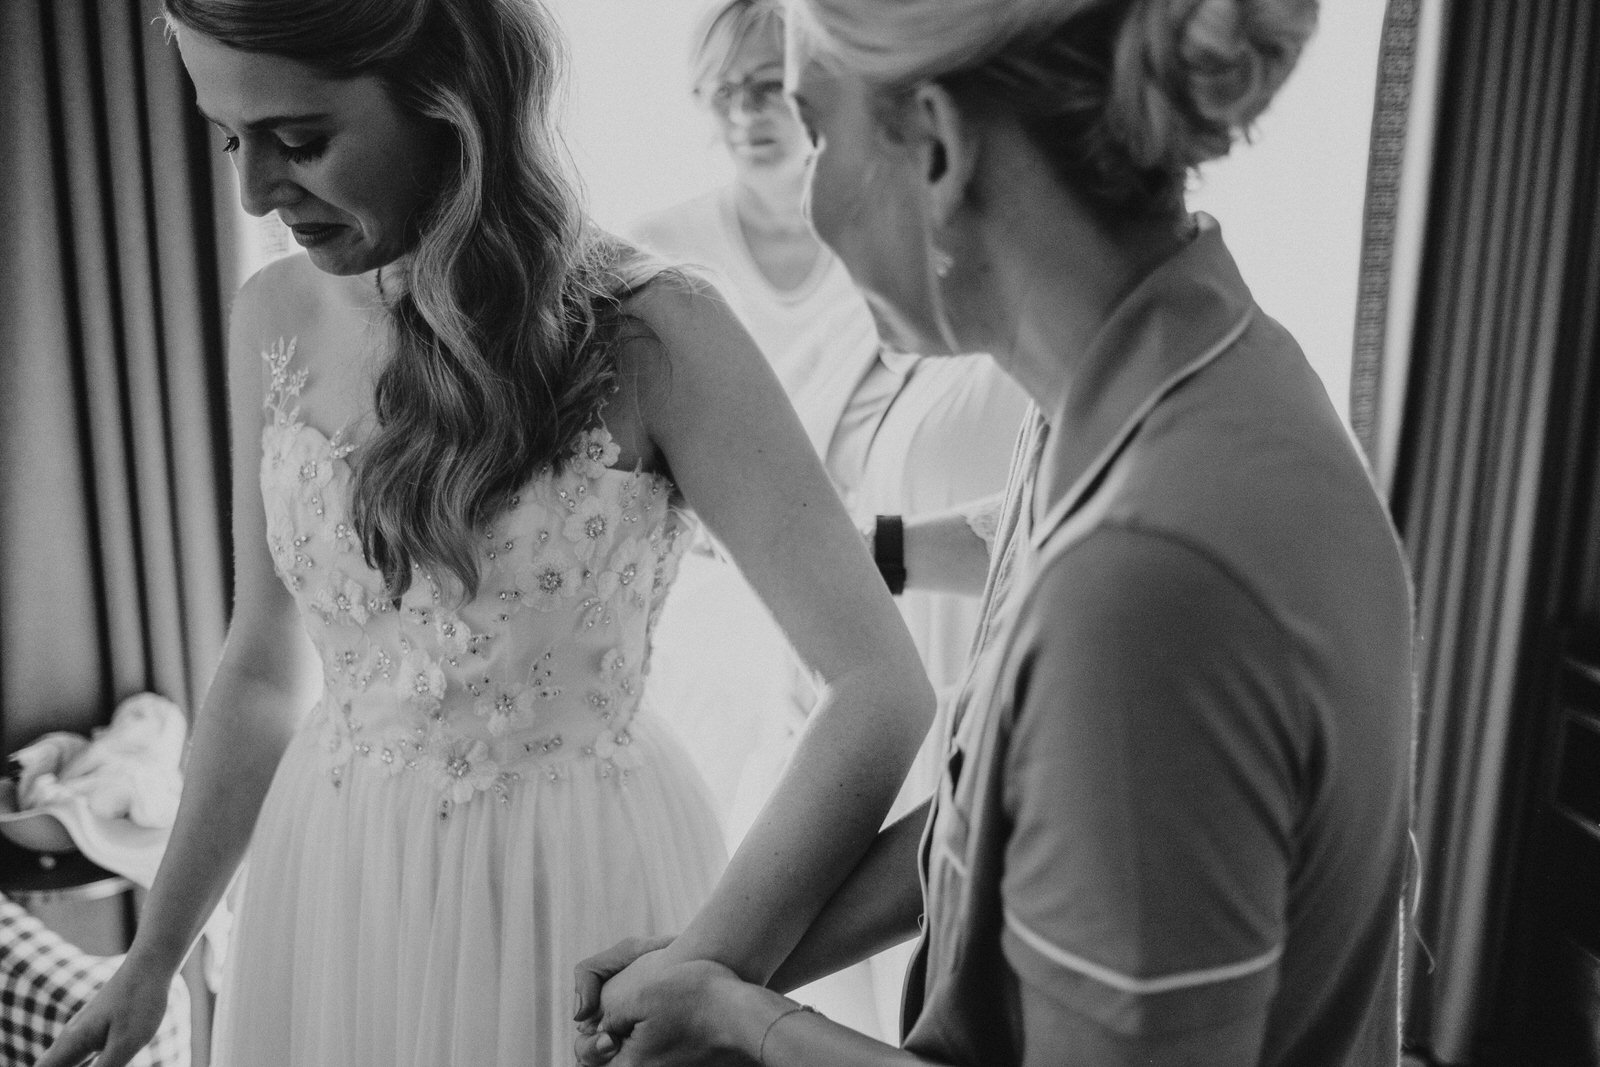 Oxford_Mississippi_wedding_photographer_11.JPG